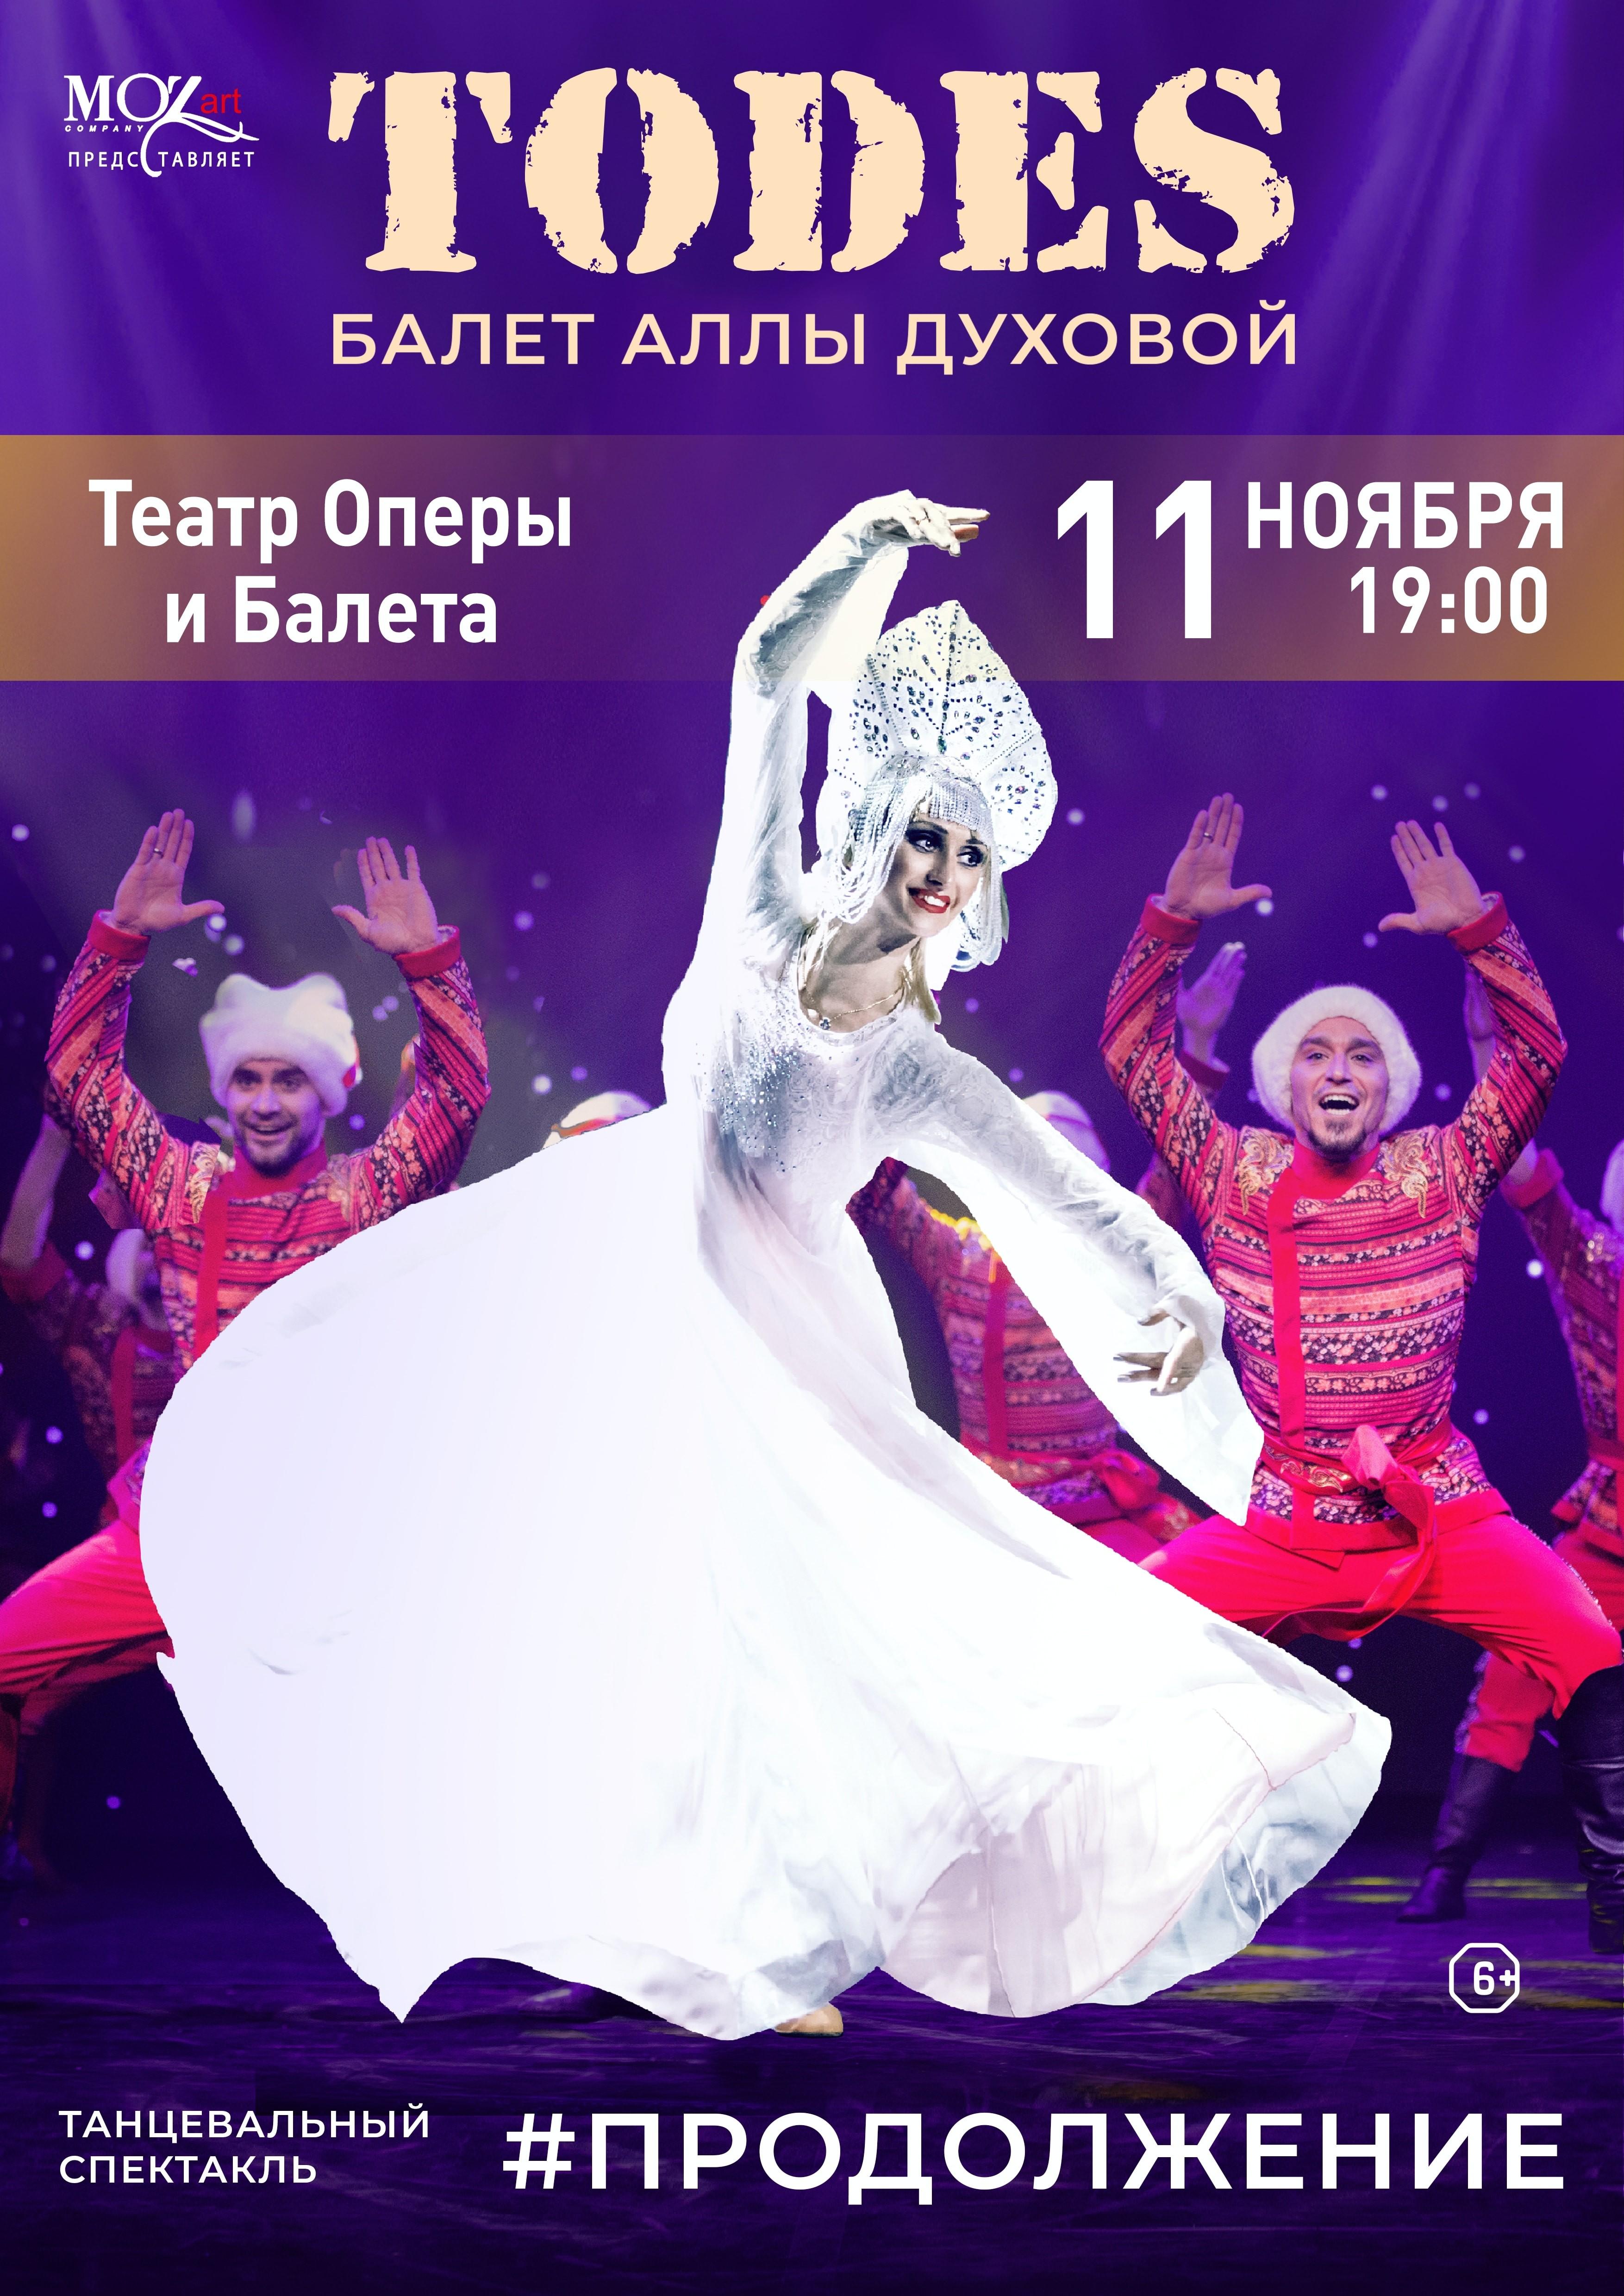 Балет Аллы Духовой Тодес